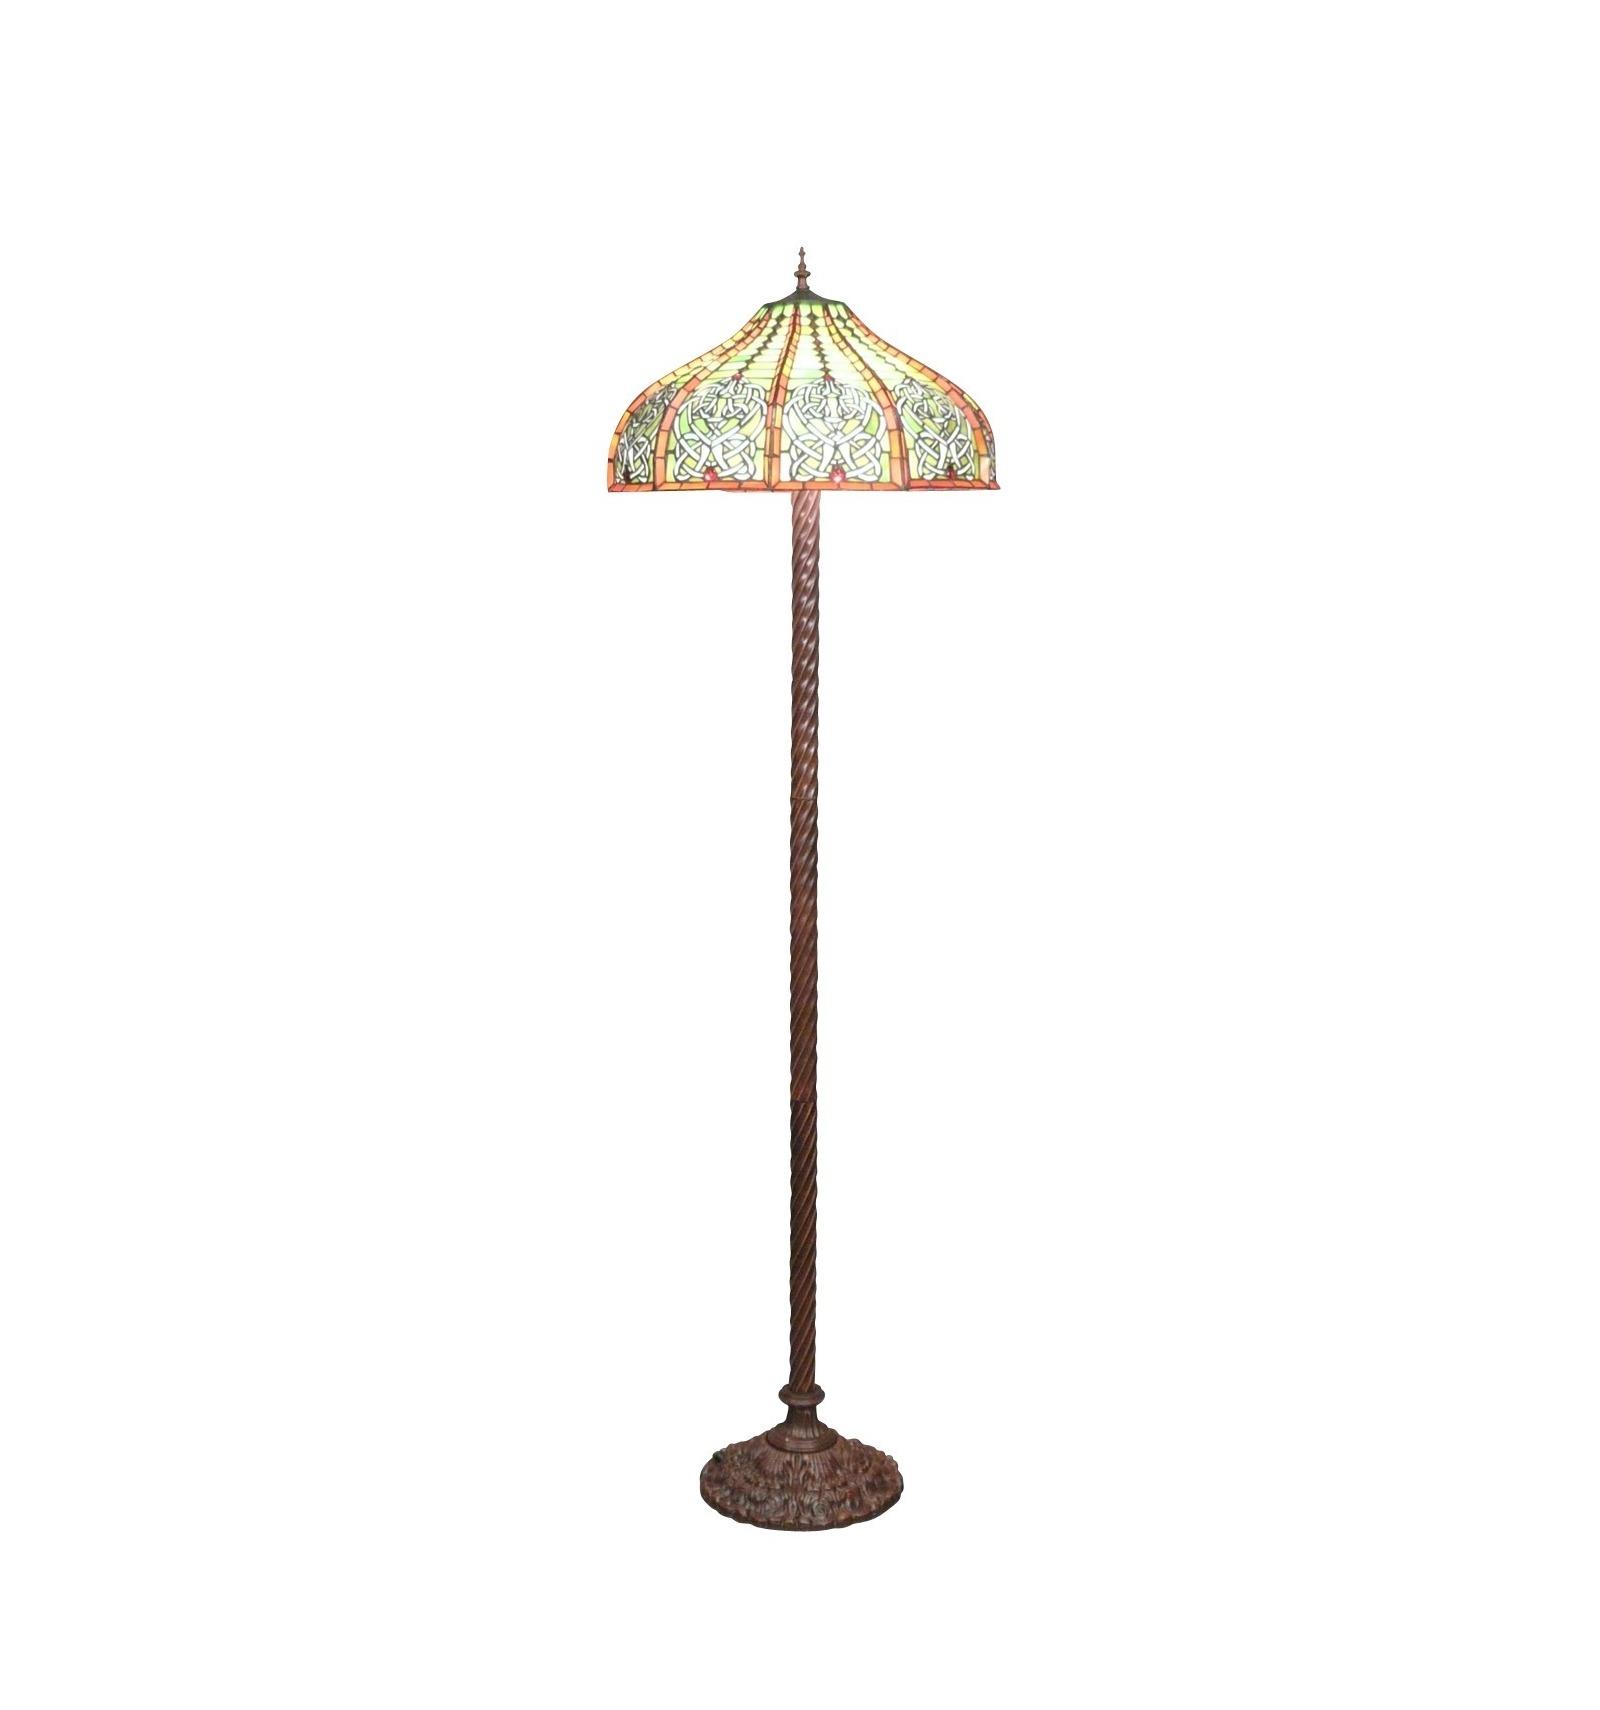 floor lamp tiffany reproduction of an original lamp With reproduction tiffany floor lamp